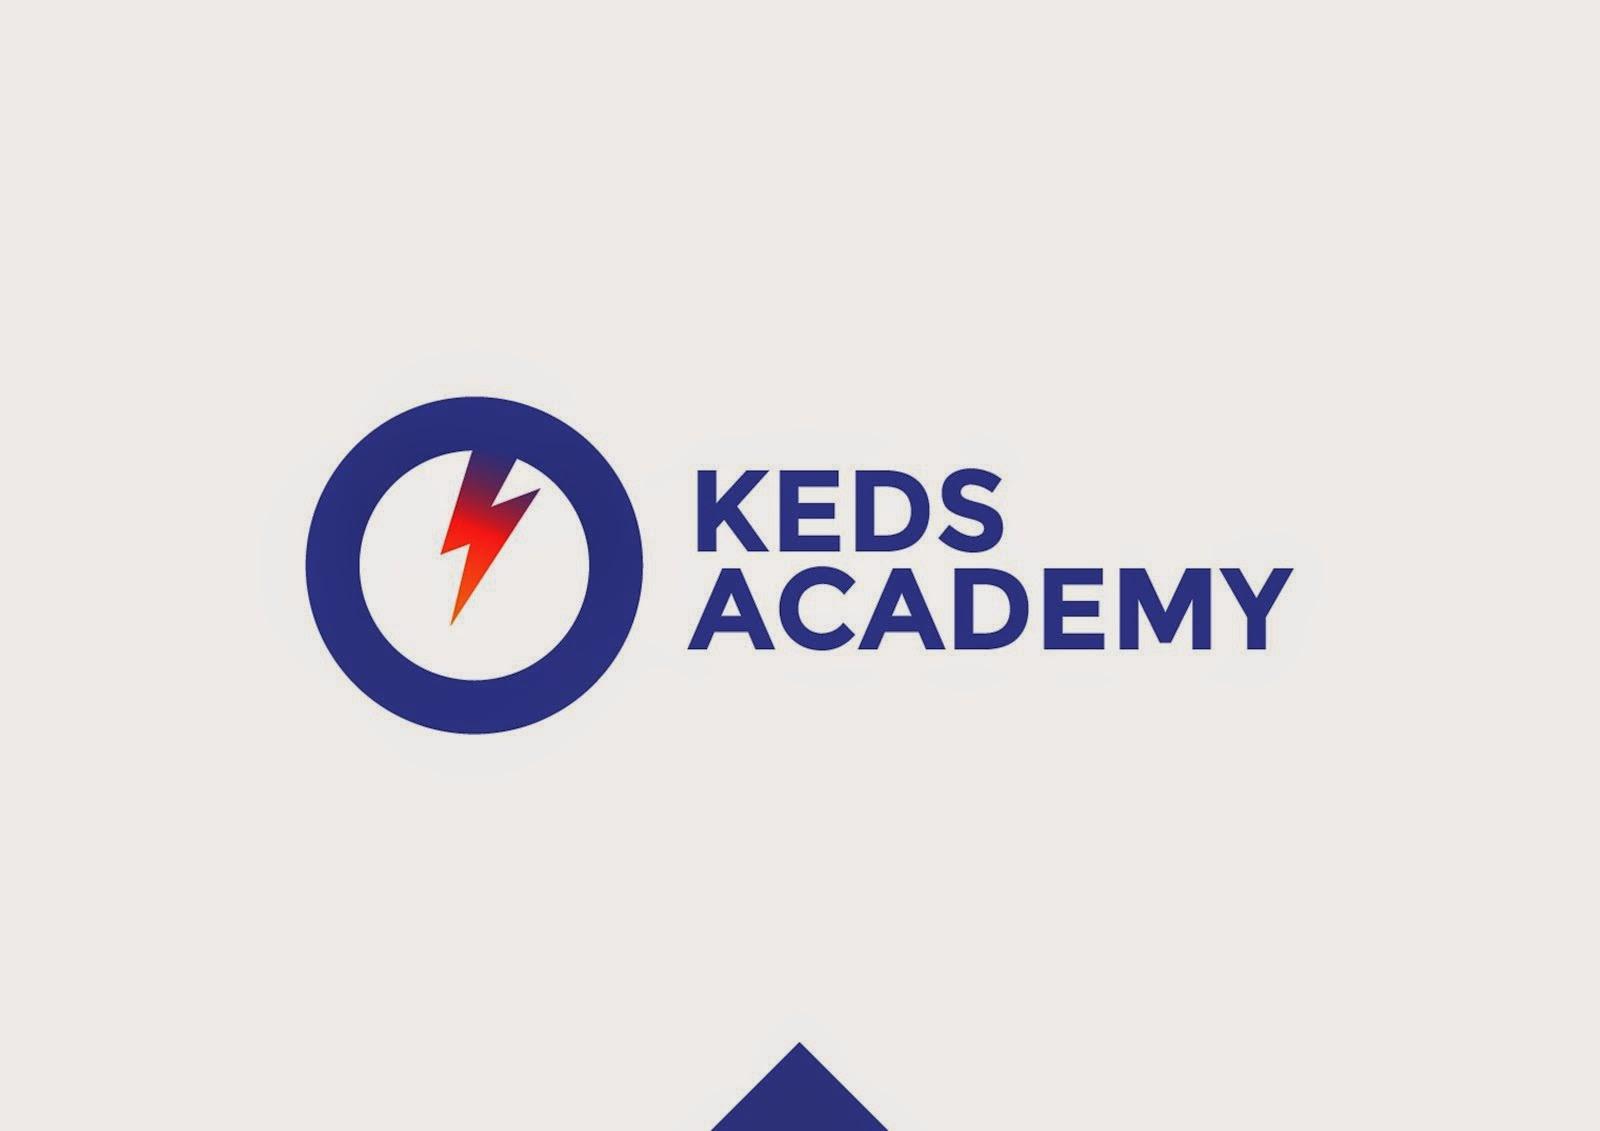 KEDS ACADEMY